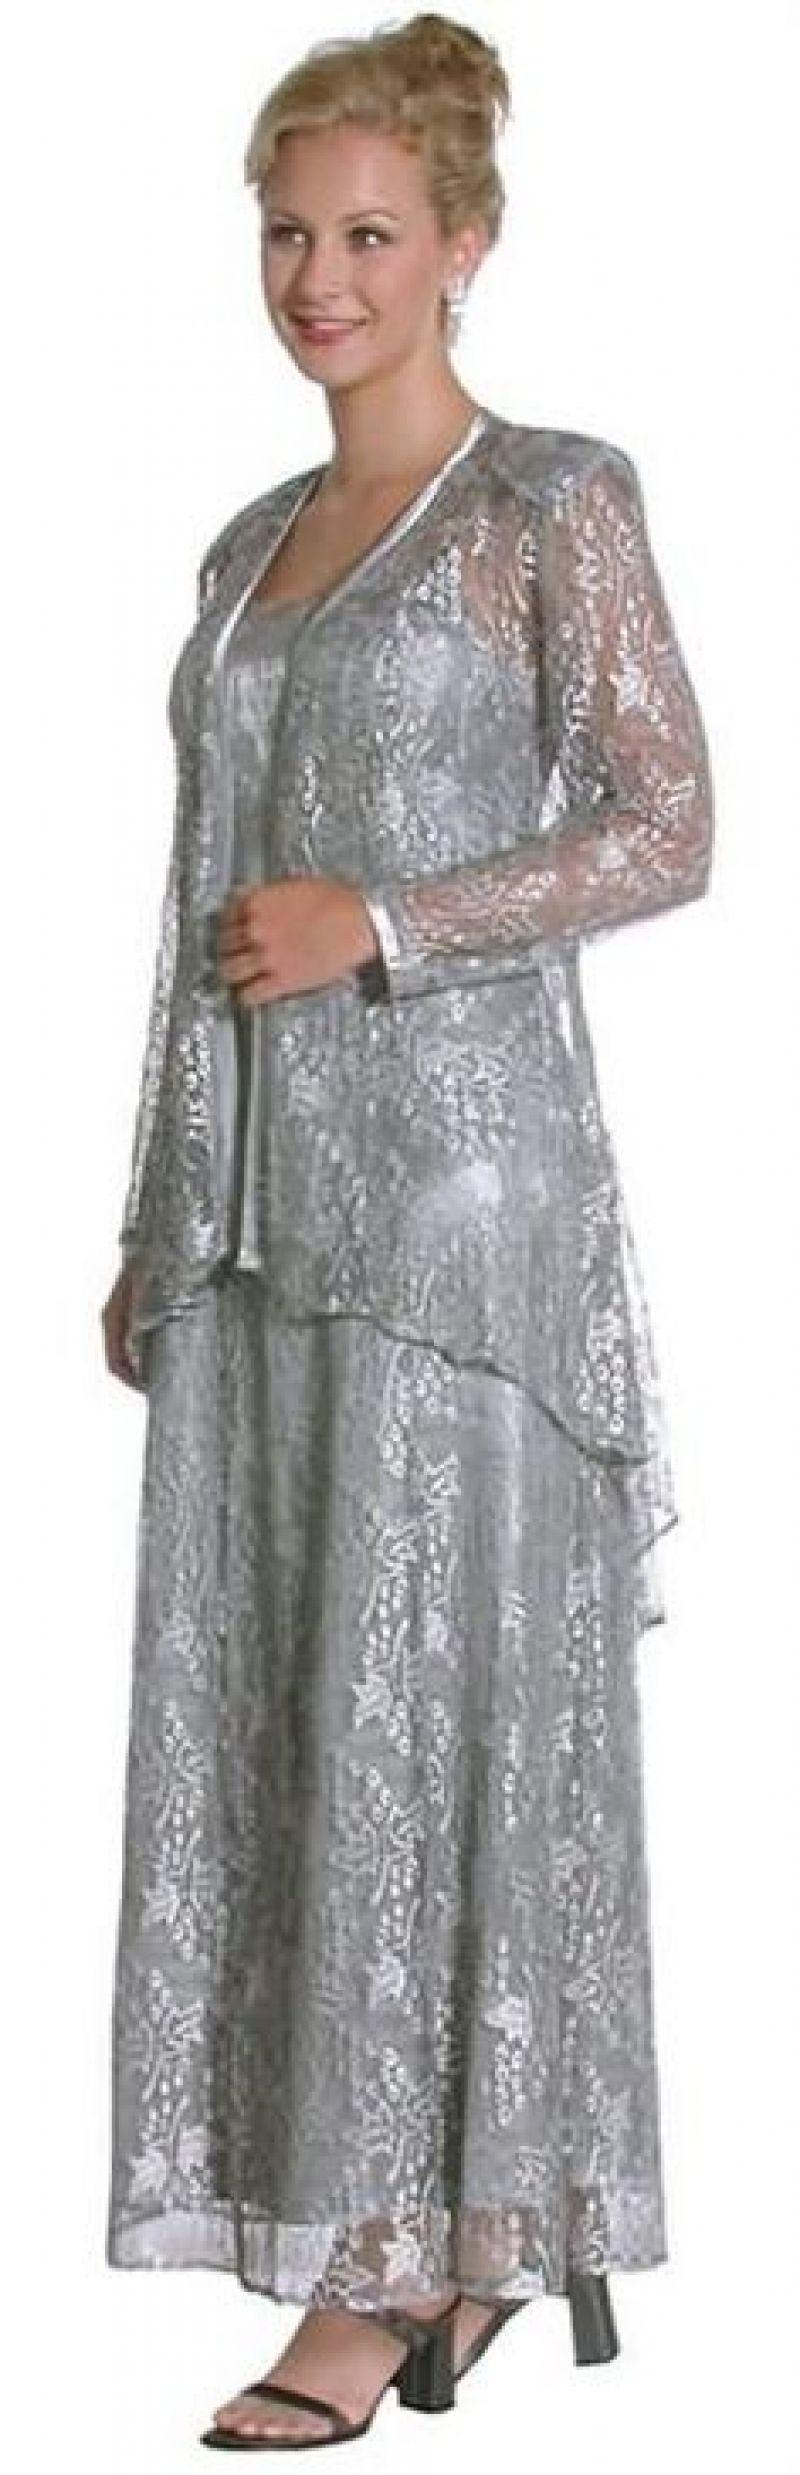 Famousipod Berbagi Informasi Tentang Pertanian Mother Wedding Dress Grandma Dress Mothers Dresses [ 2475 x 800 Pixel ]